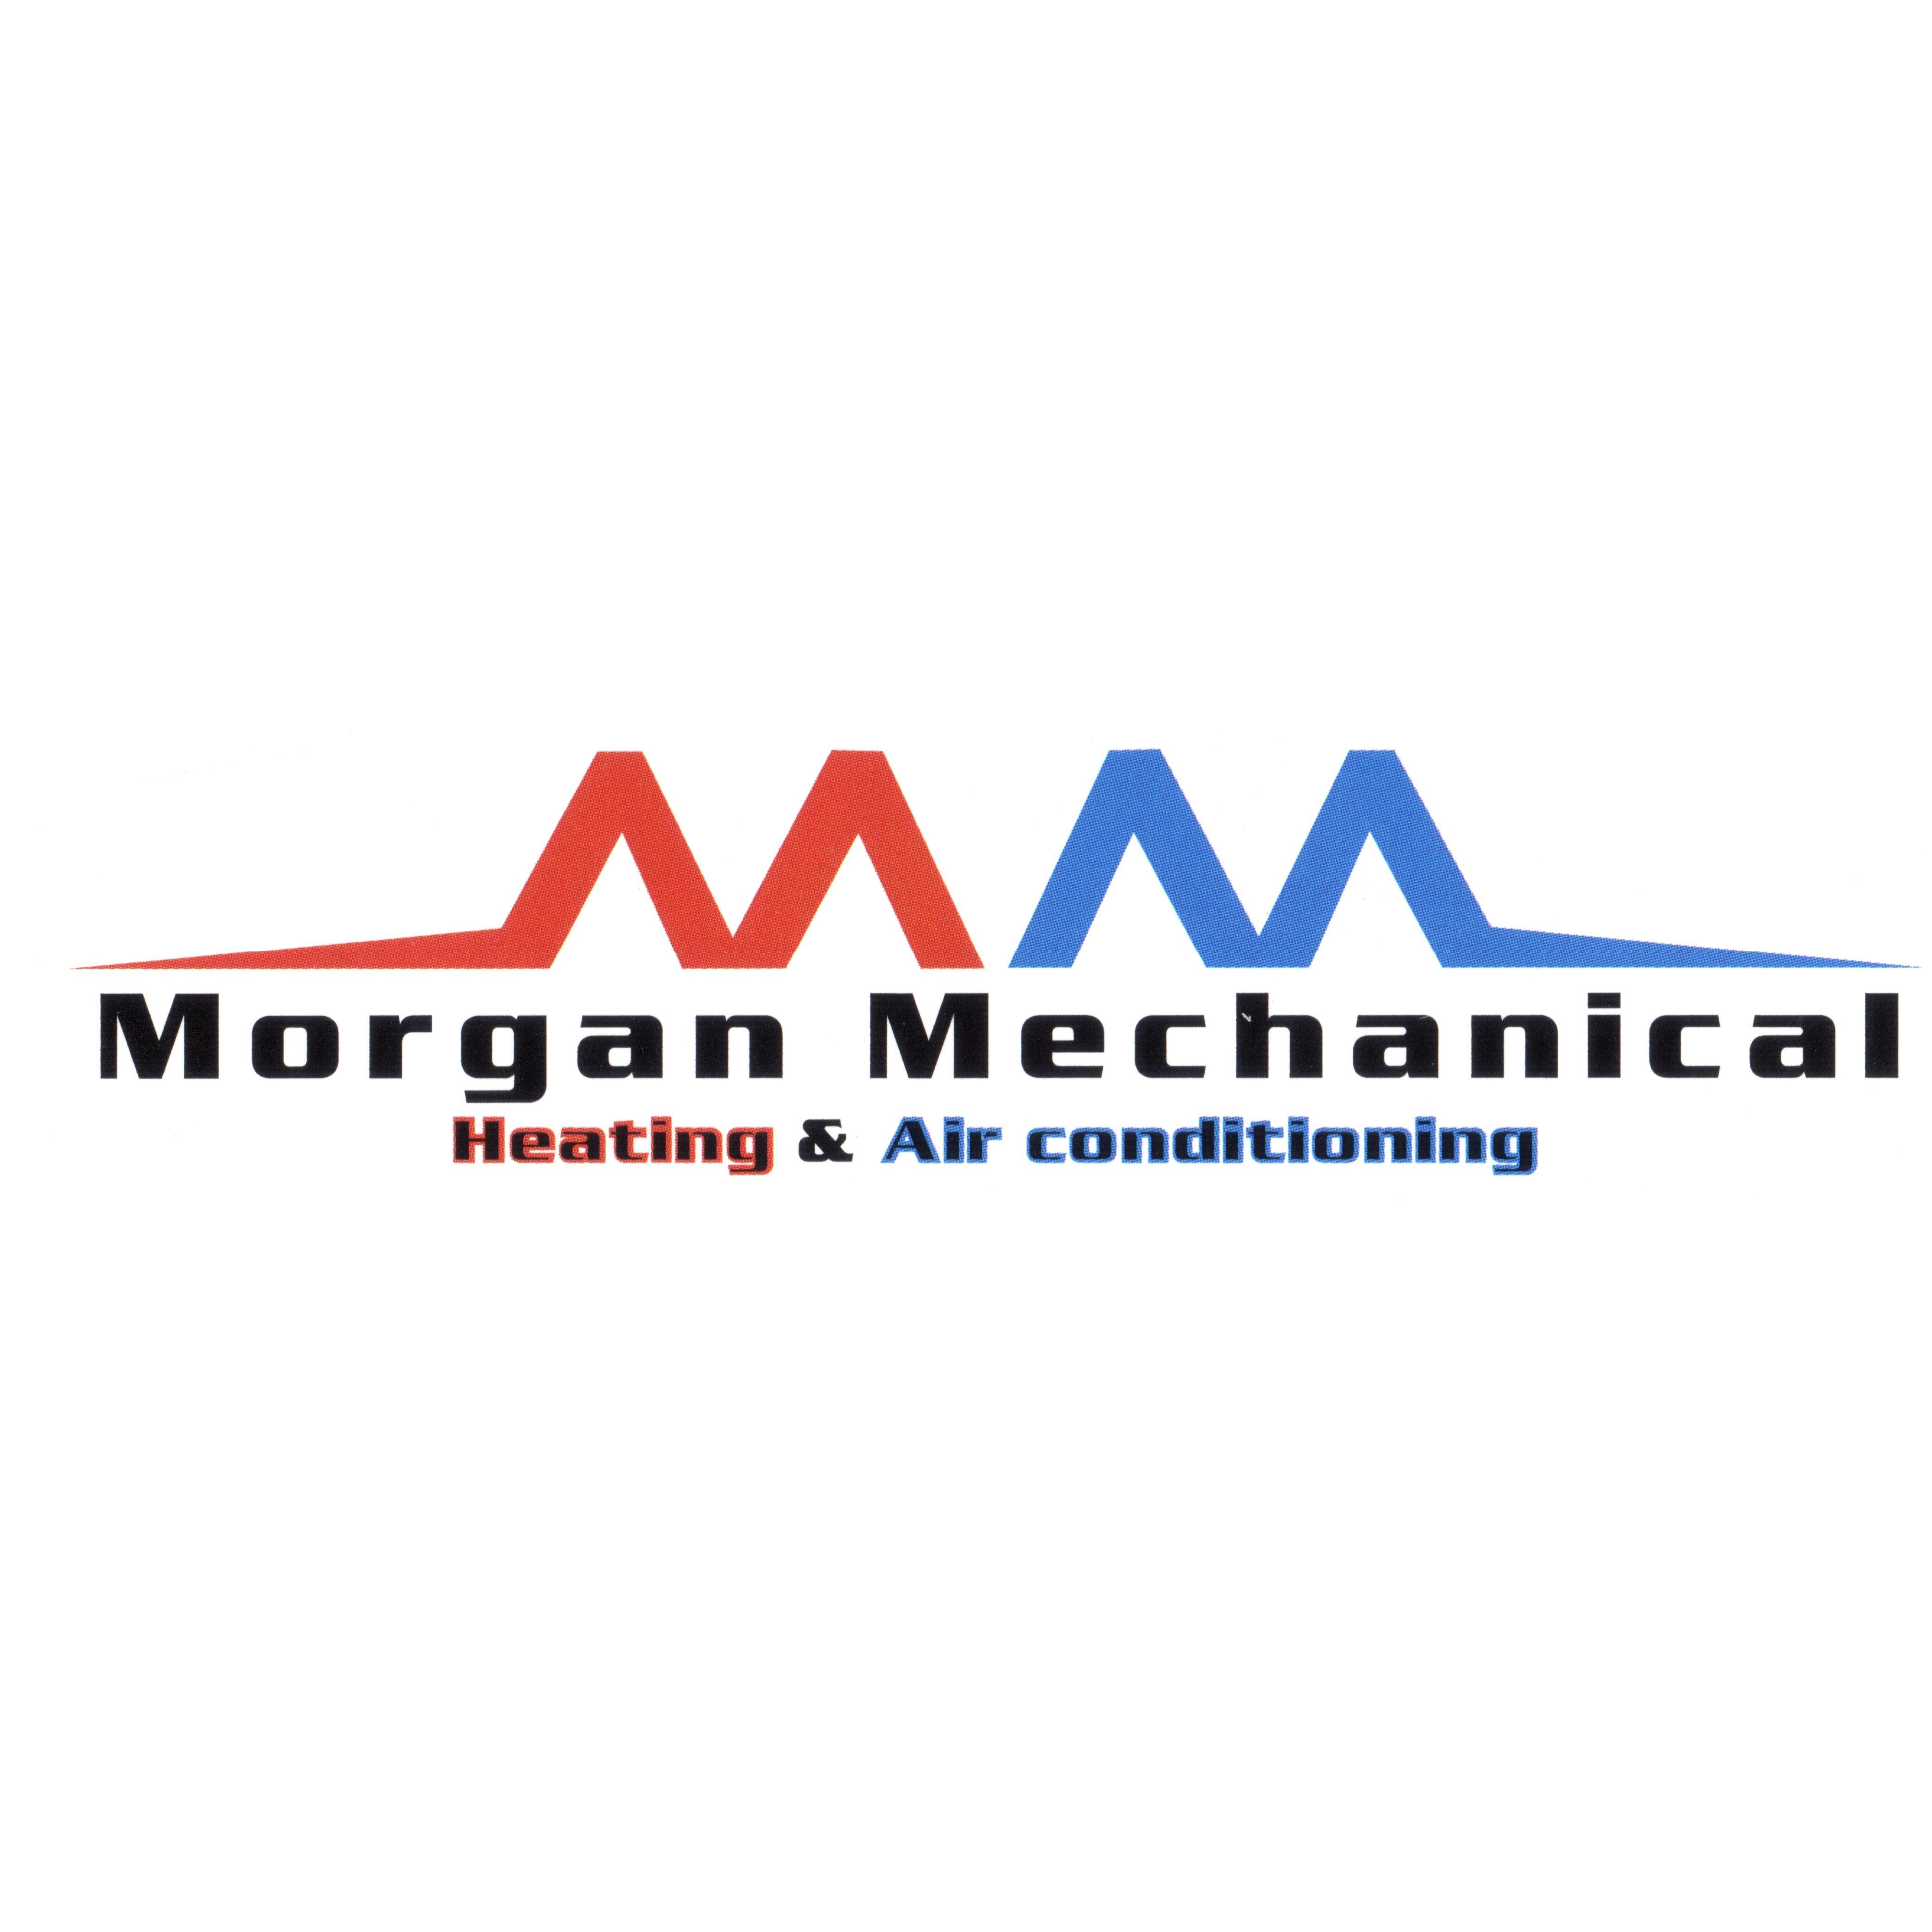 Morgan Mechanical Heating & Air Conditioning - Rancho Cordova, CA - Heating & Air Conditioning